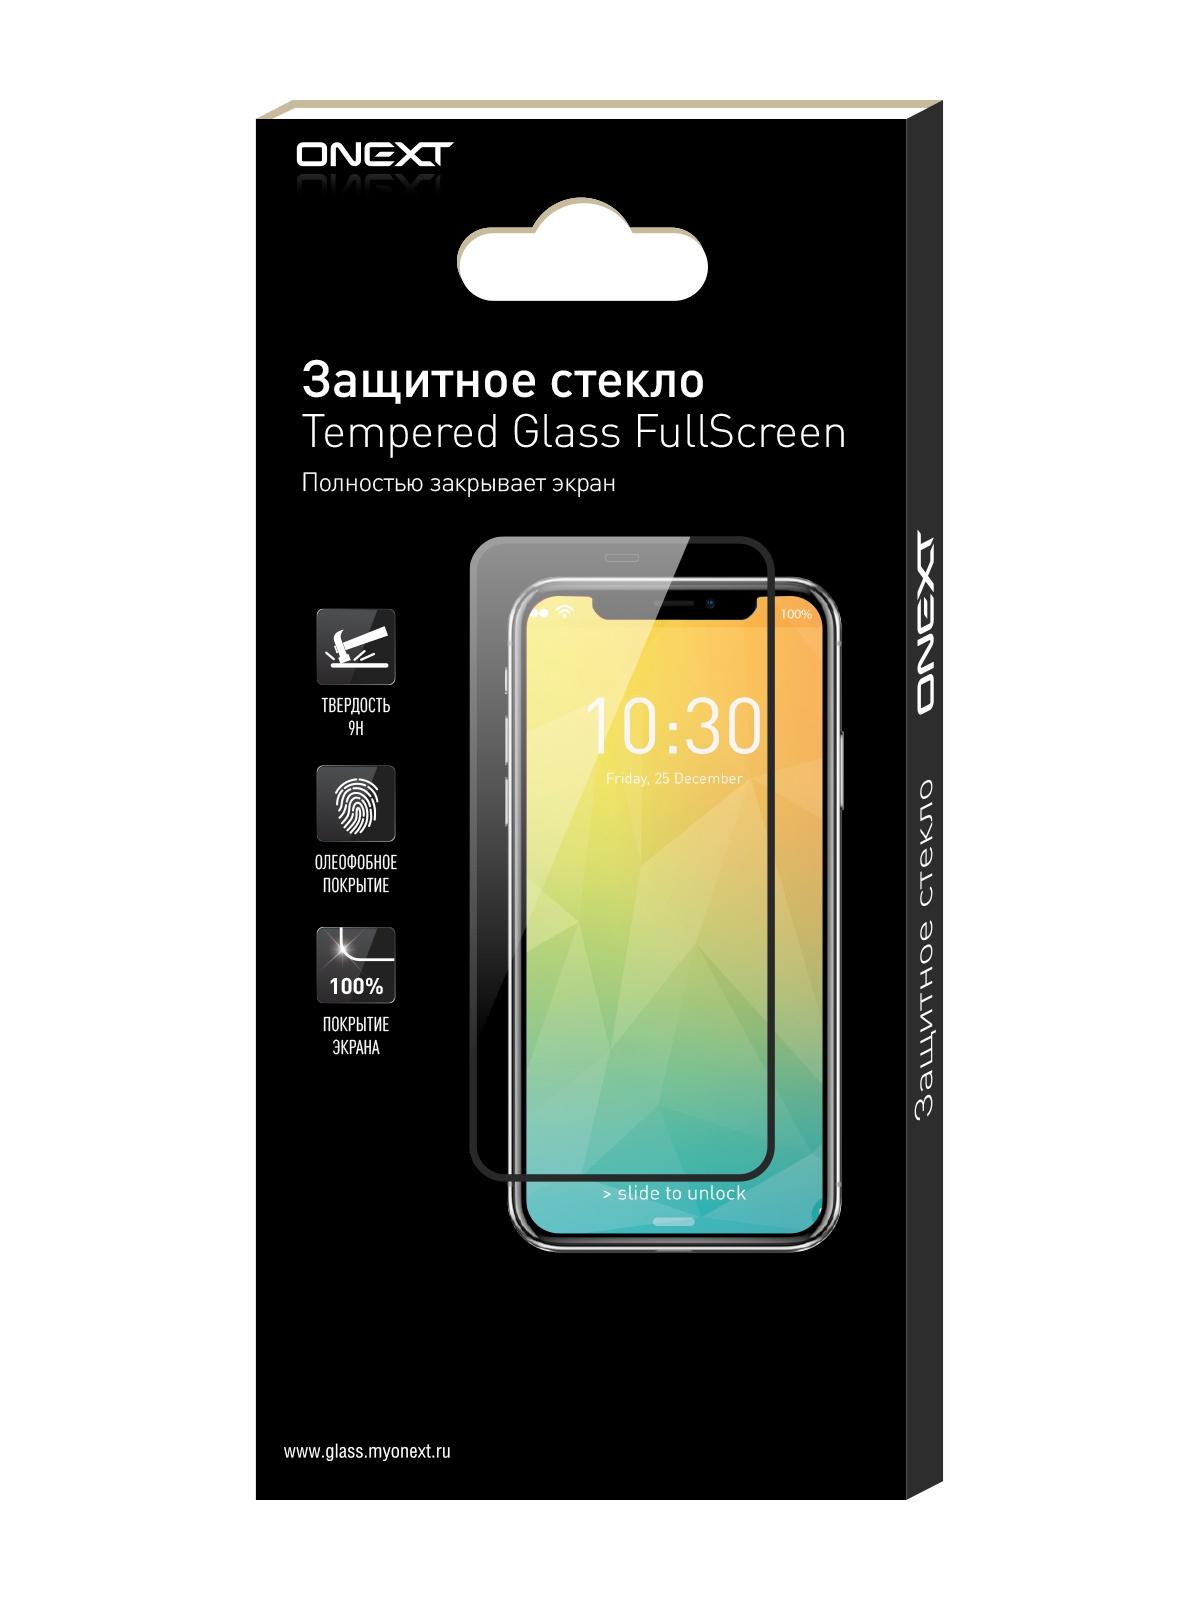 Защитное стекло ONEXT iPhone 6/6S Plus с рамкой c силиконовыми краями защитное стекло с силиконовыми краями perfeo для черного iphone 6 6s глянцевое pf tg3d iph6 blk